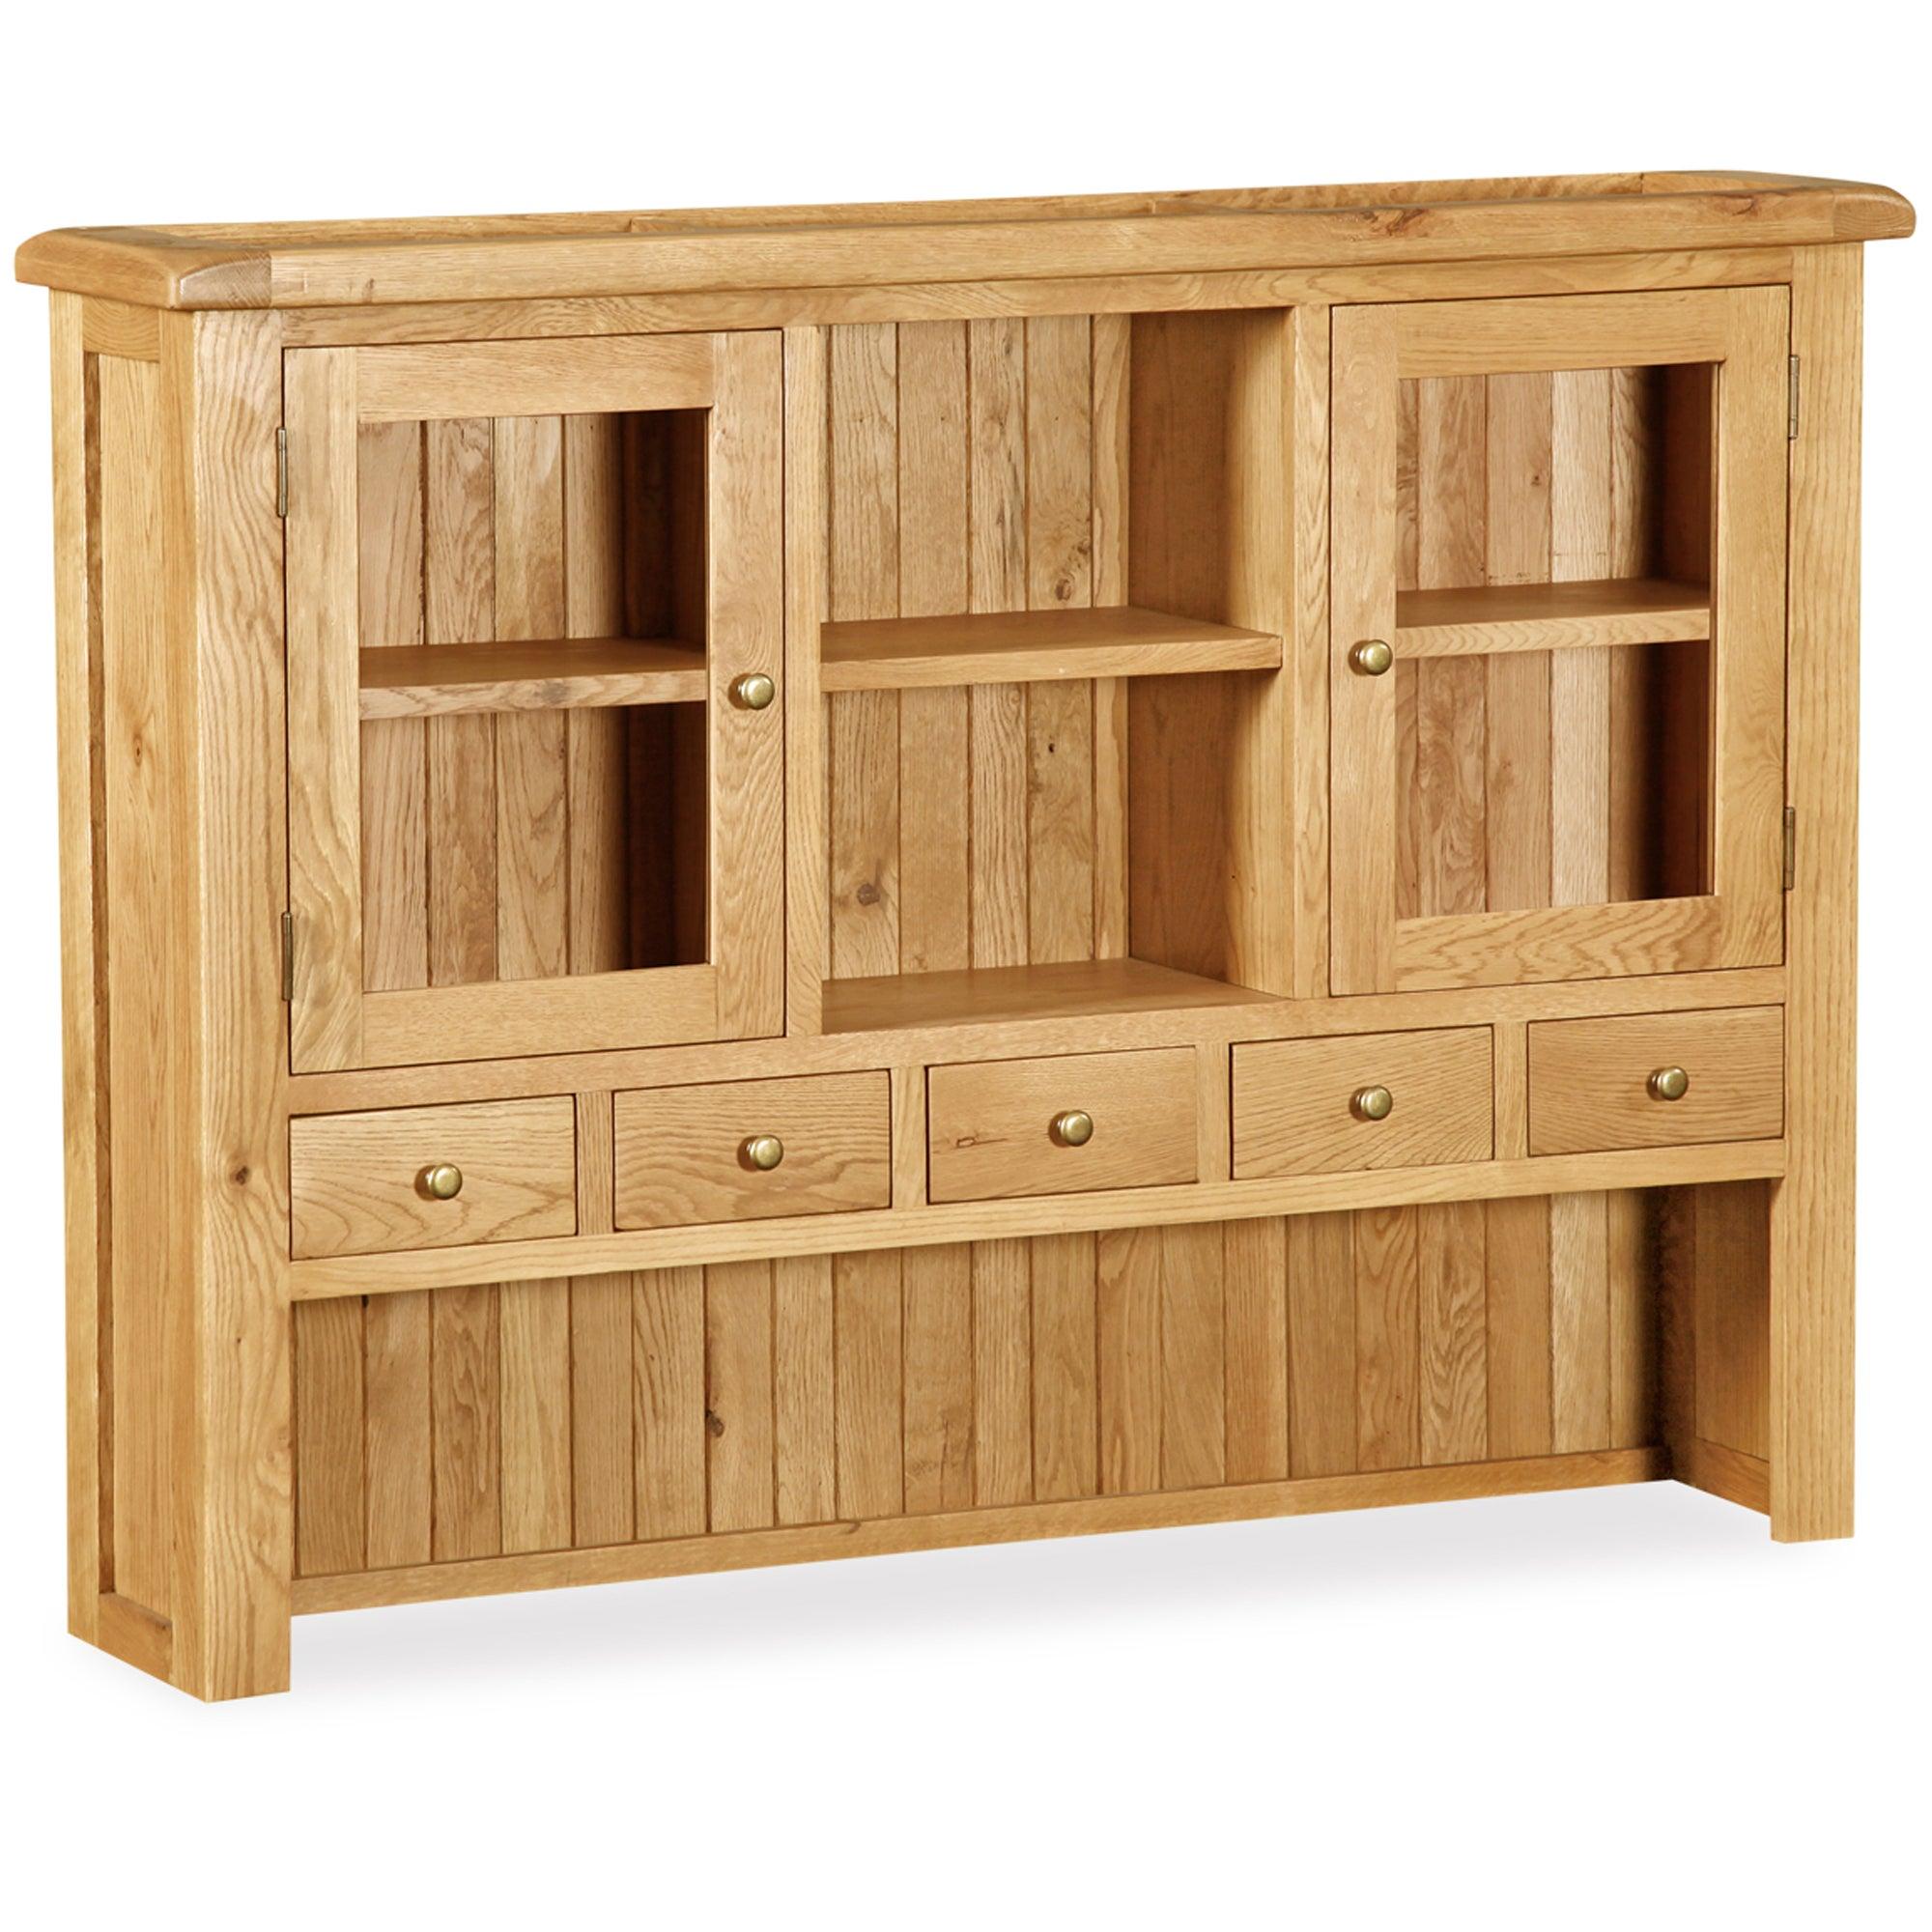 Aylesbury Oak Dresser Top